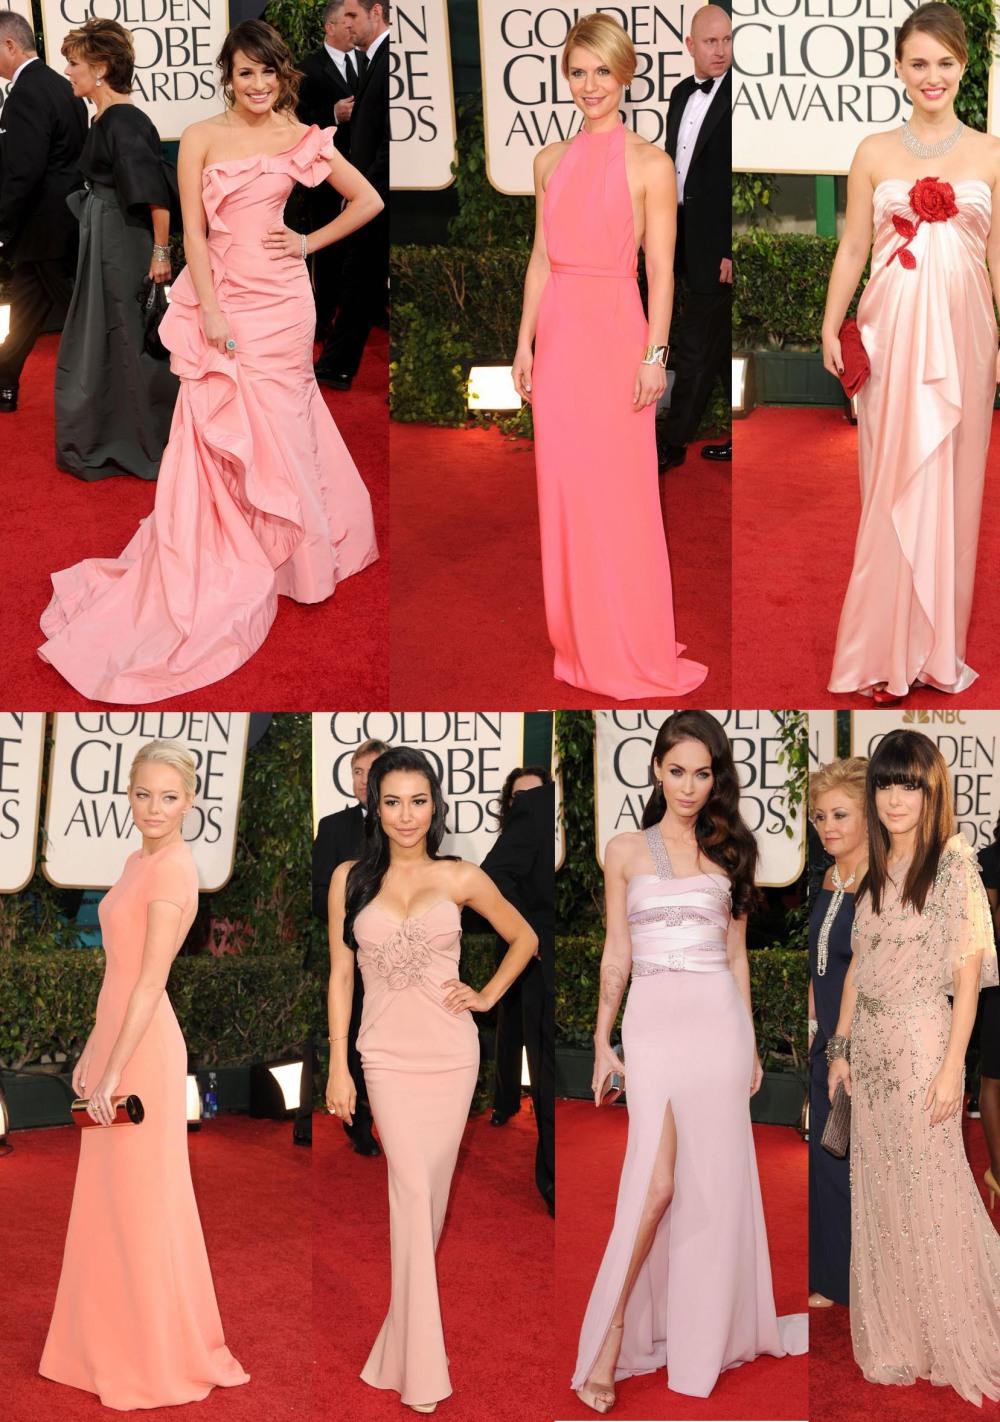 Vestidos Rosas Golden Globes 2011